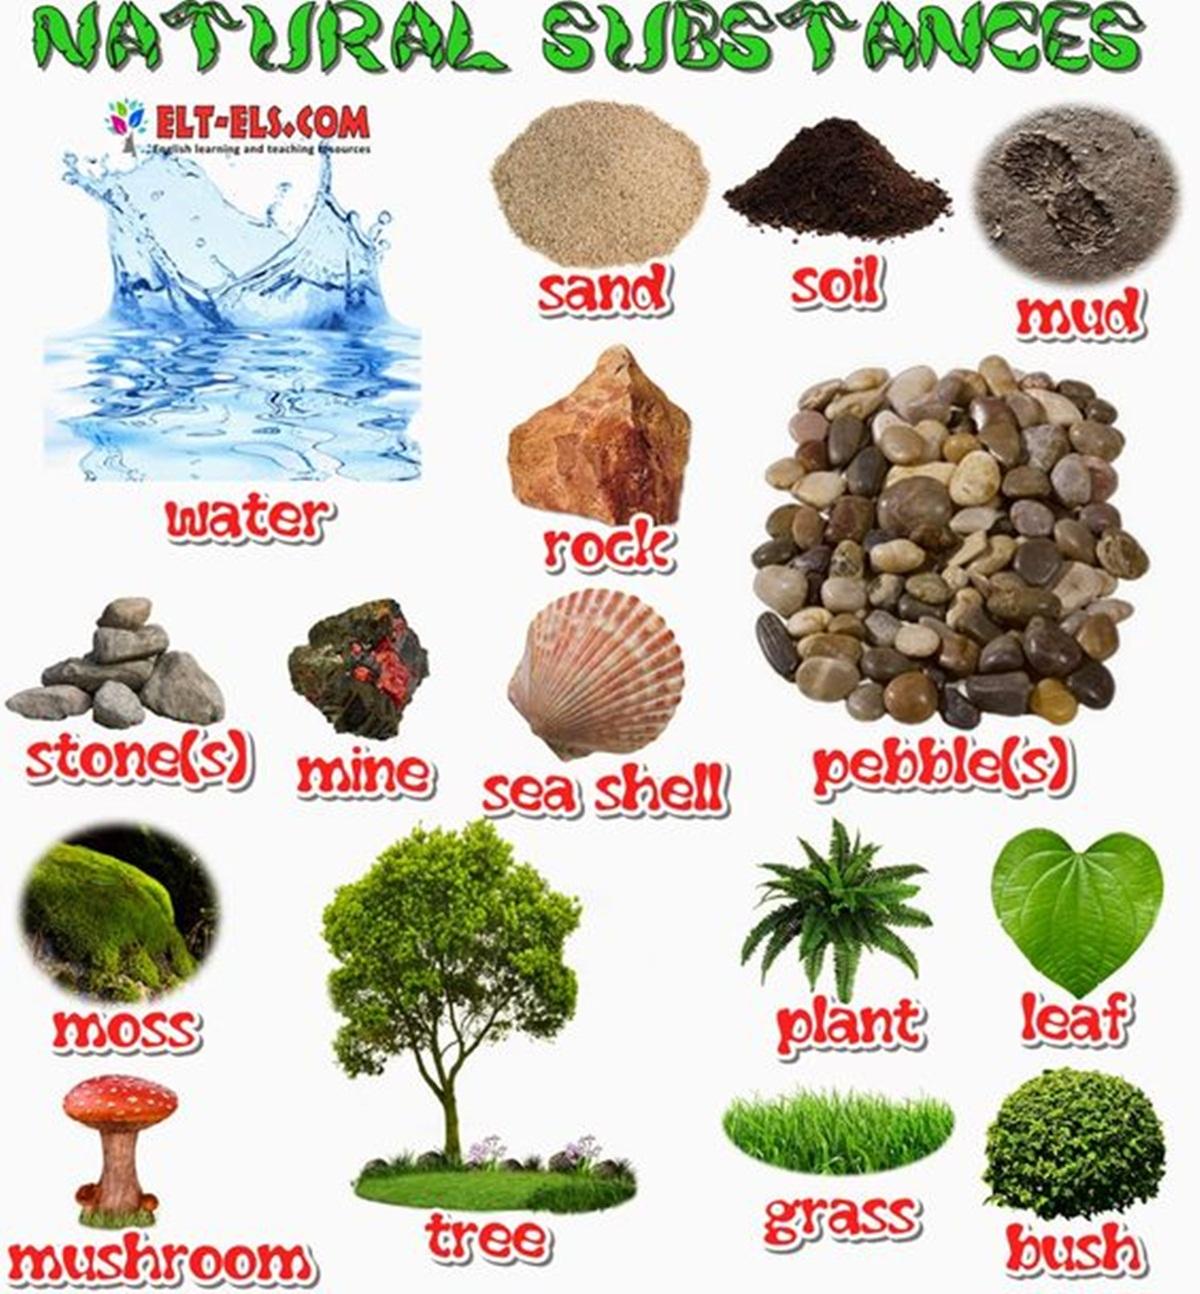 Vocabulary: NATURAL SUBSTANCES 3